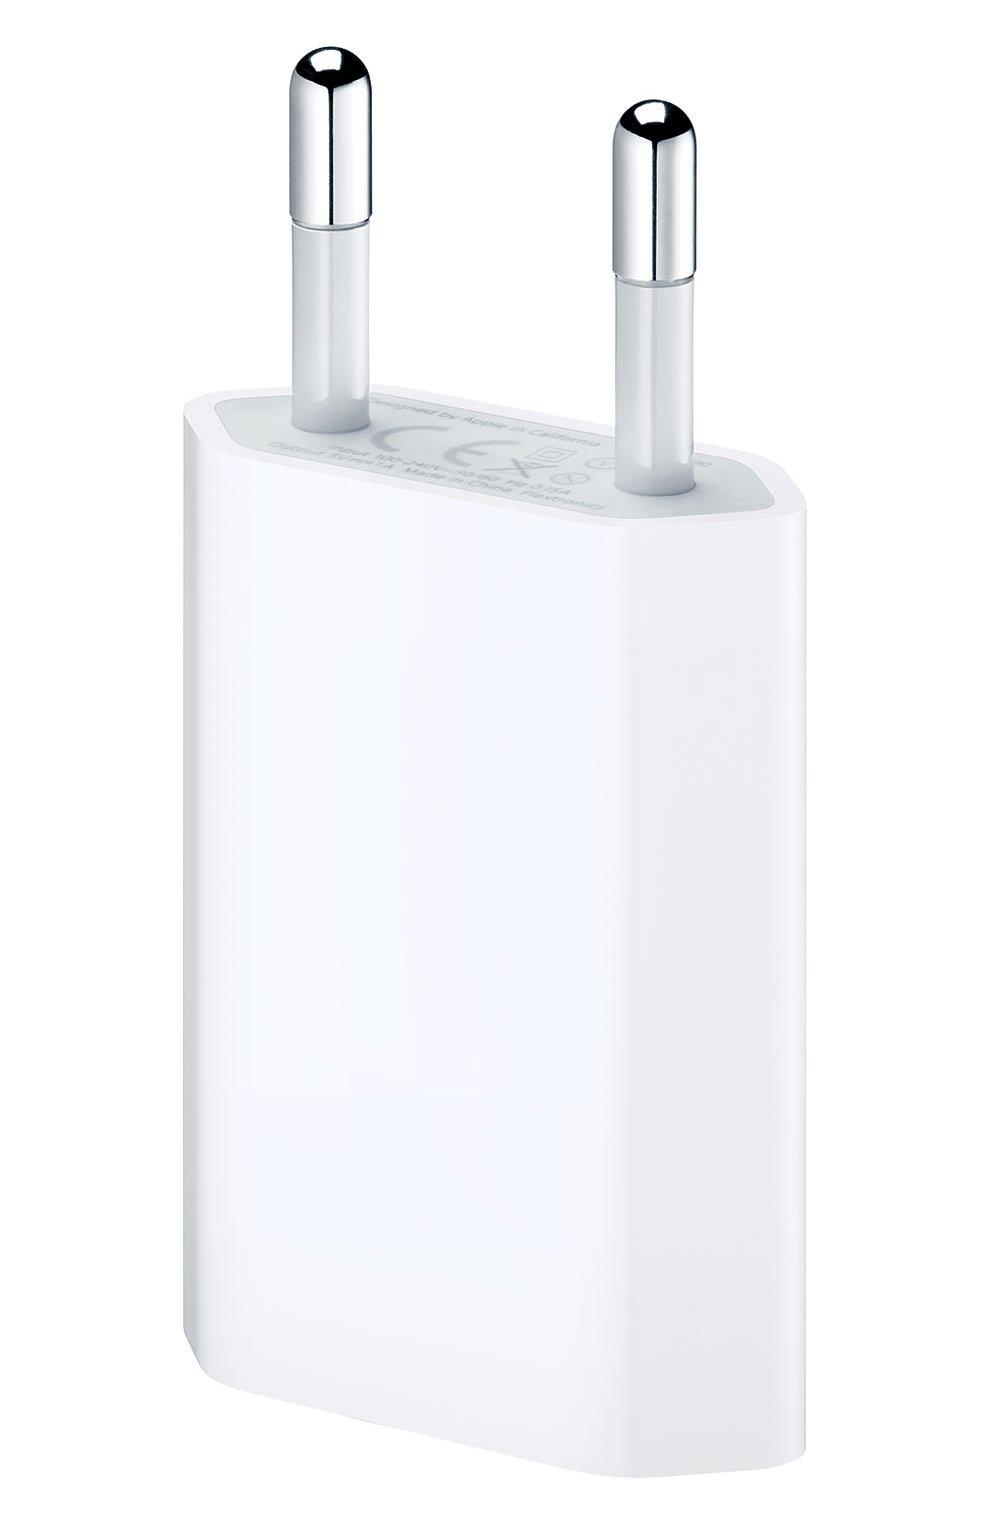 Адаптер Apple 5W   Фото №1